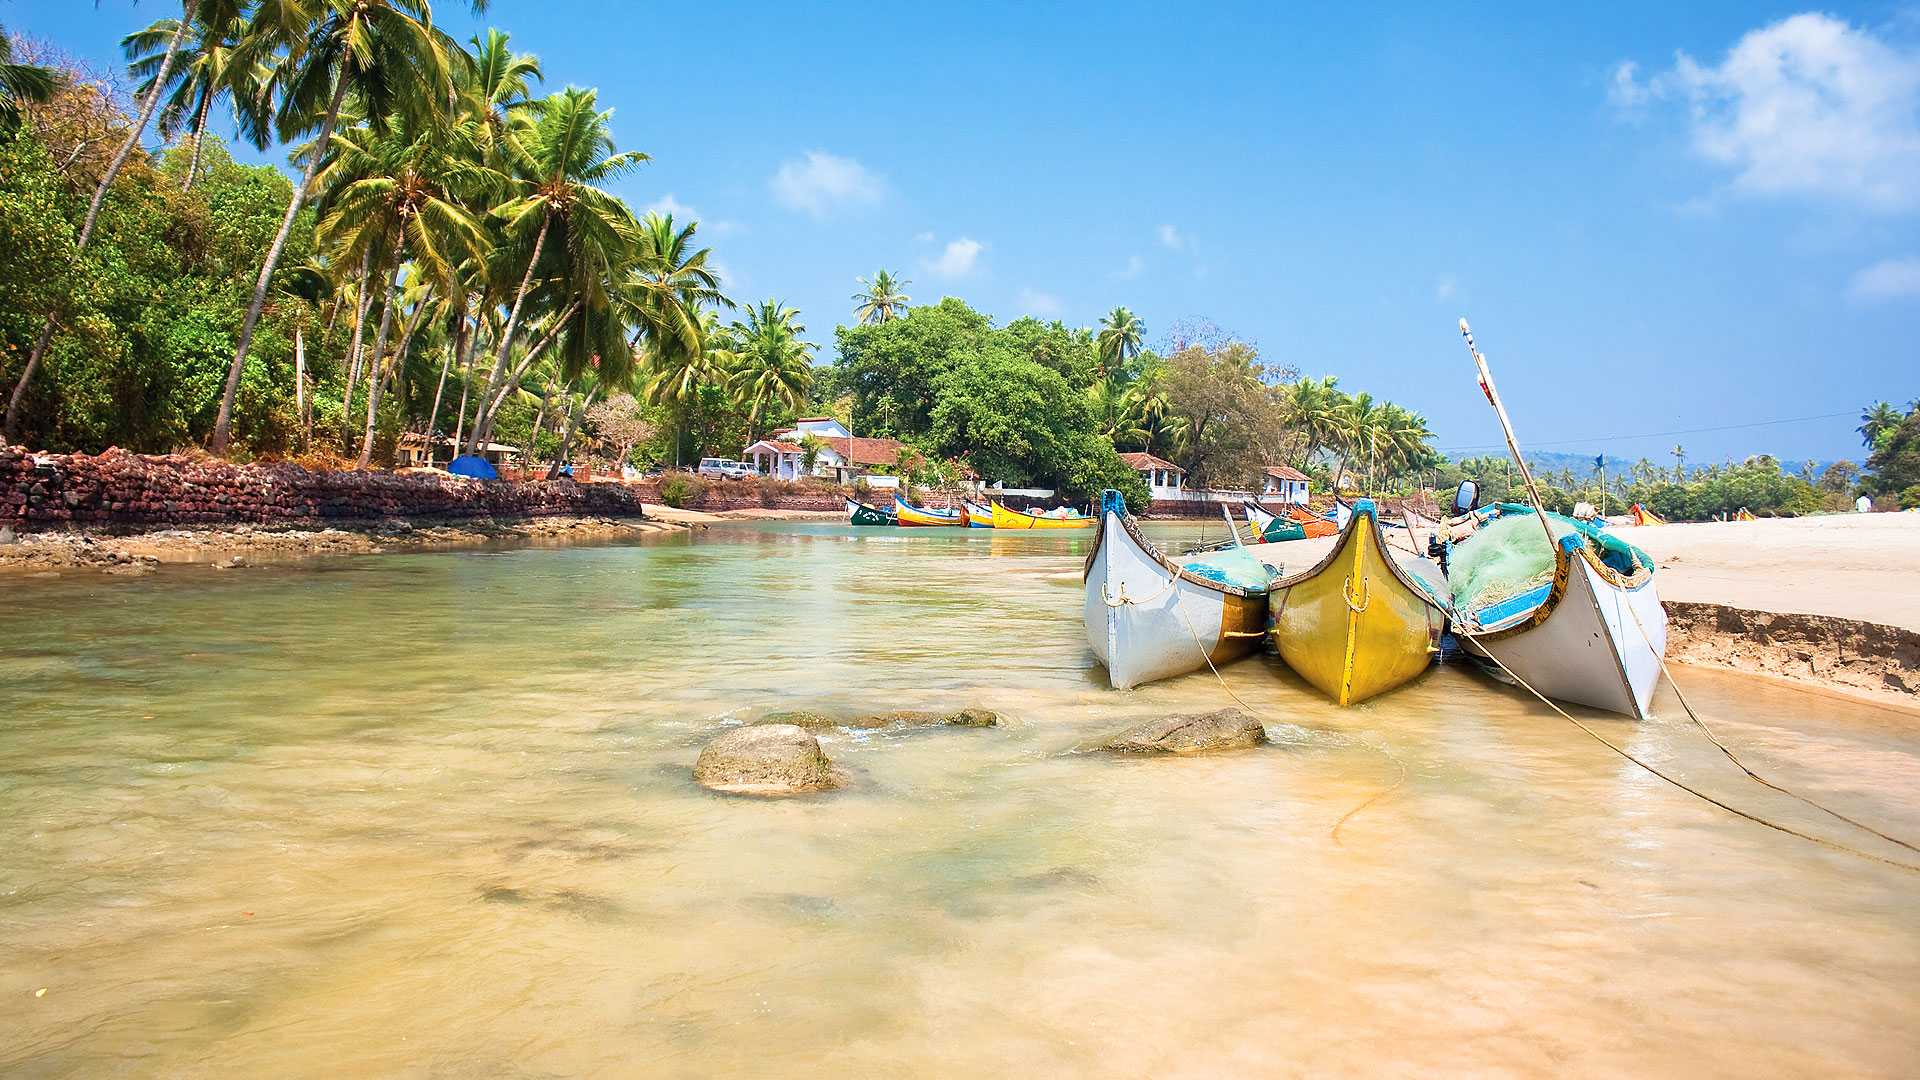 661522 Goa Beach Wallpapers 1920x1080